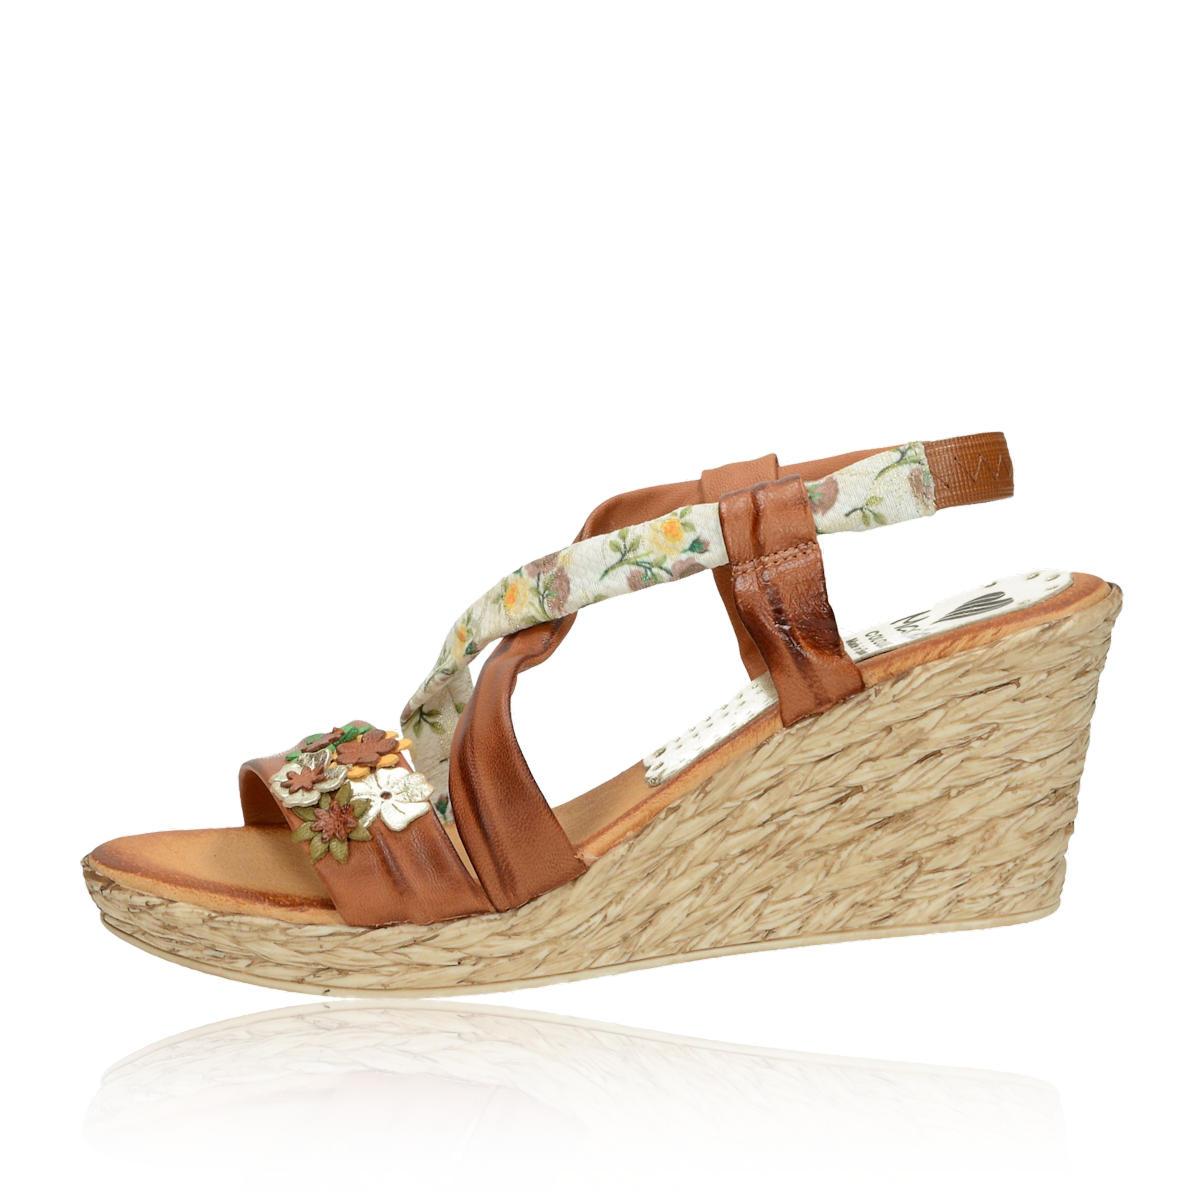 f52792326e87 ... Marila dámske letné sandále s kvetmi - koňakové ...